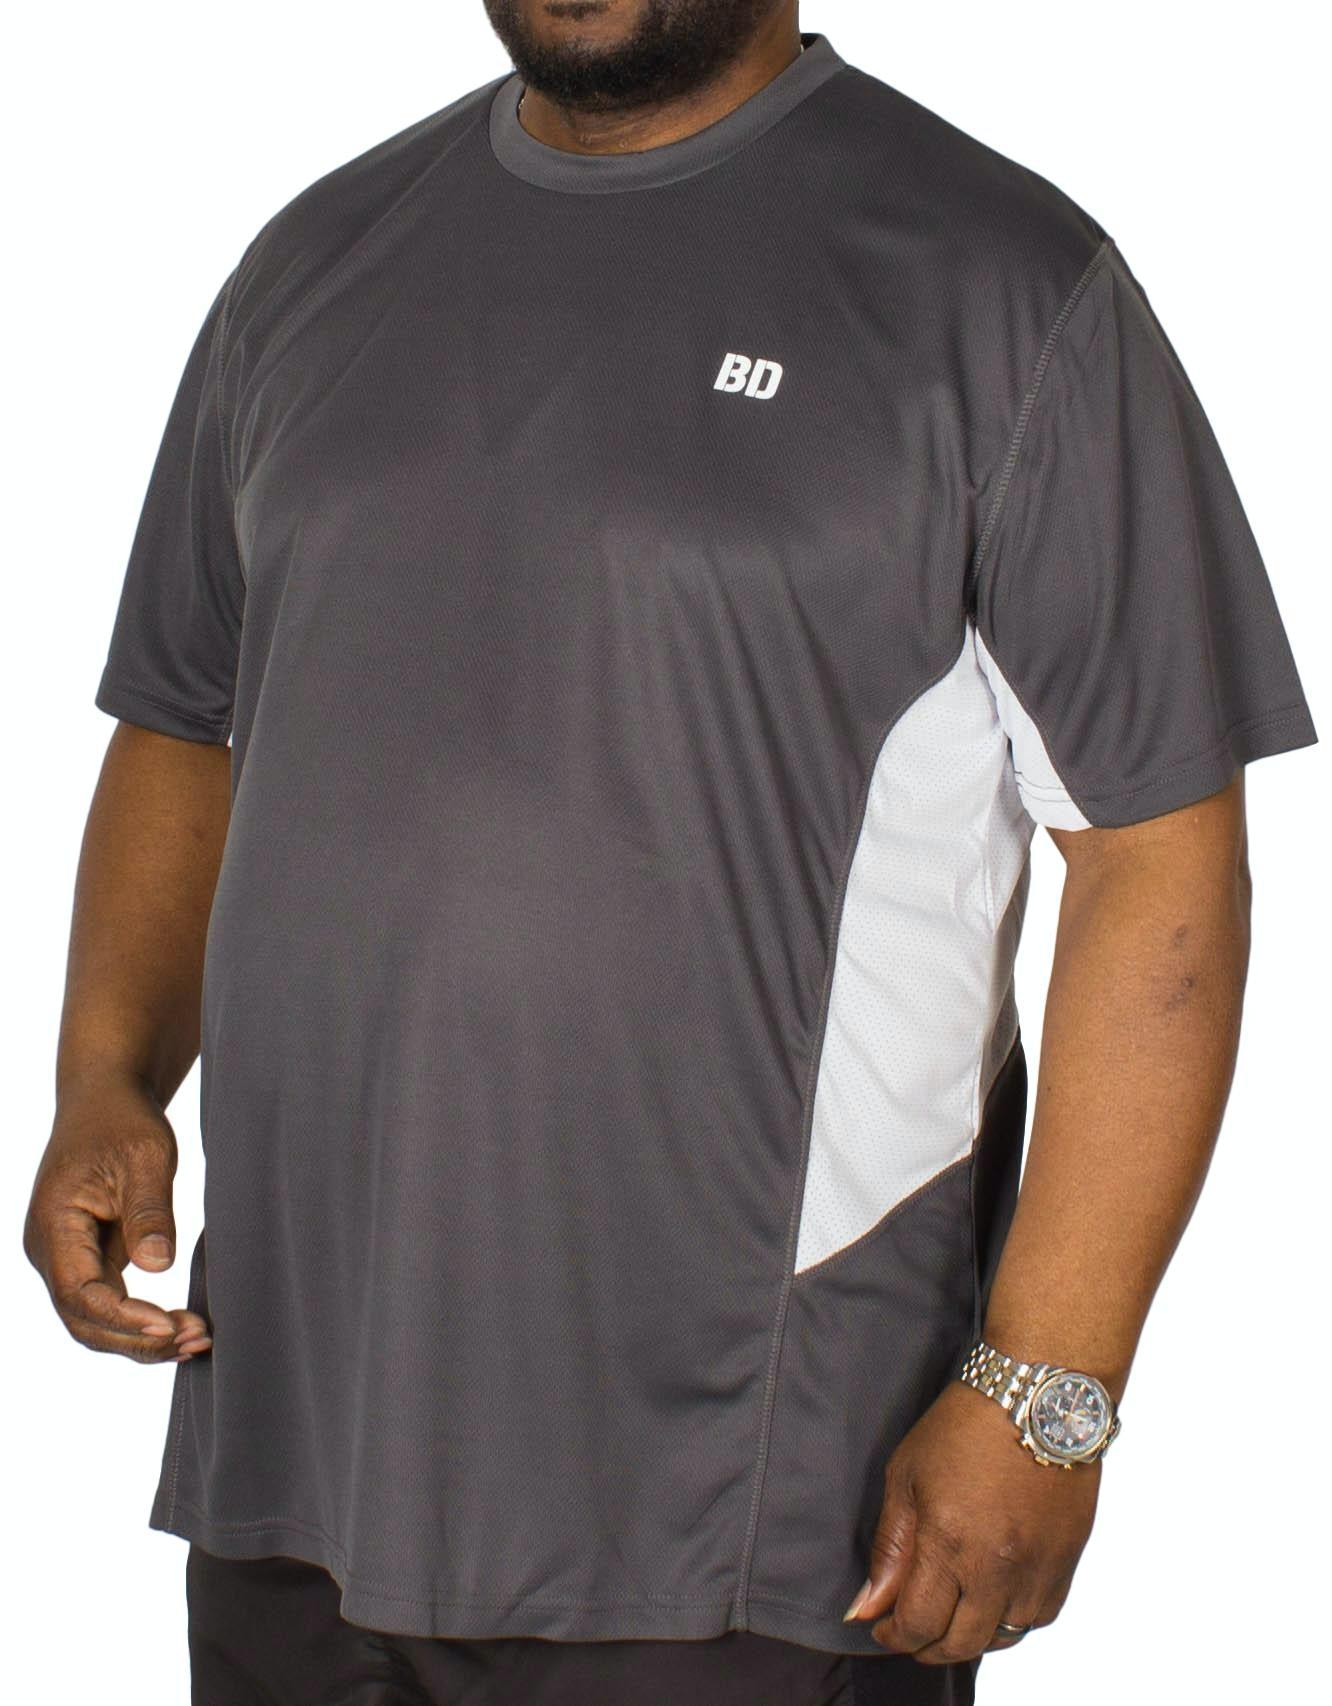 Bigdude Vented Stretch Gym T-Shirt Charcoal